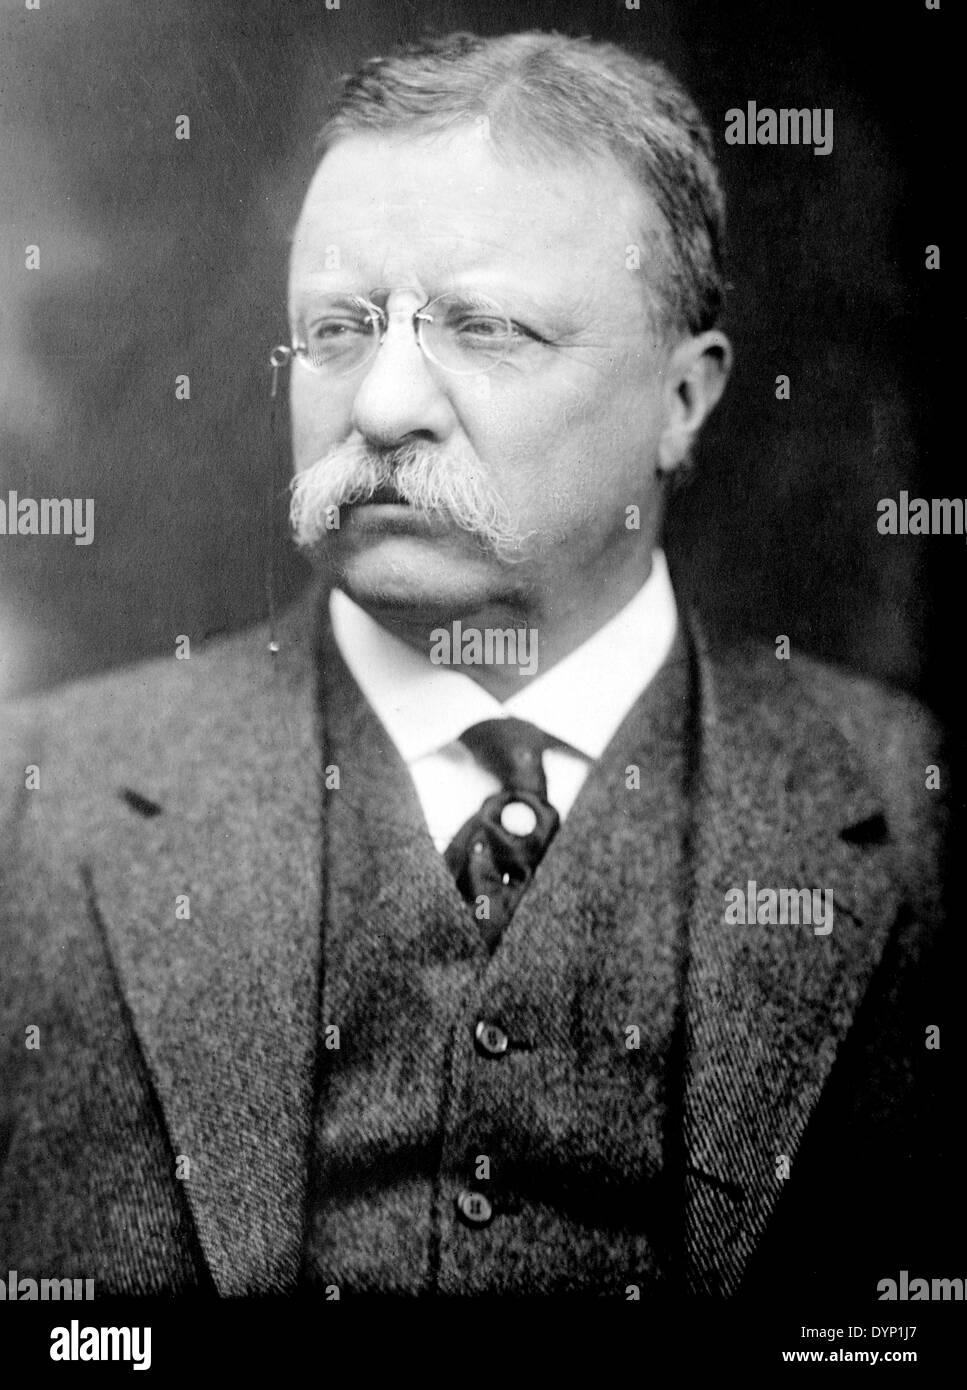 Theodore Roosevelt Jr